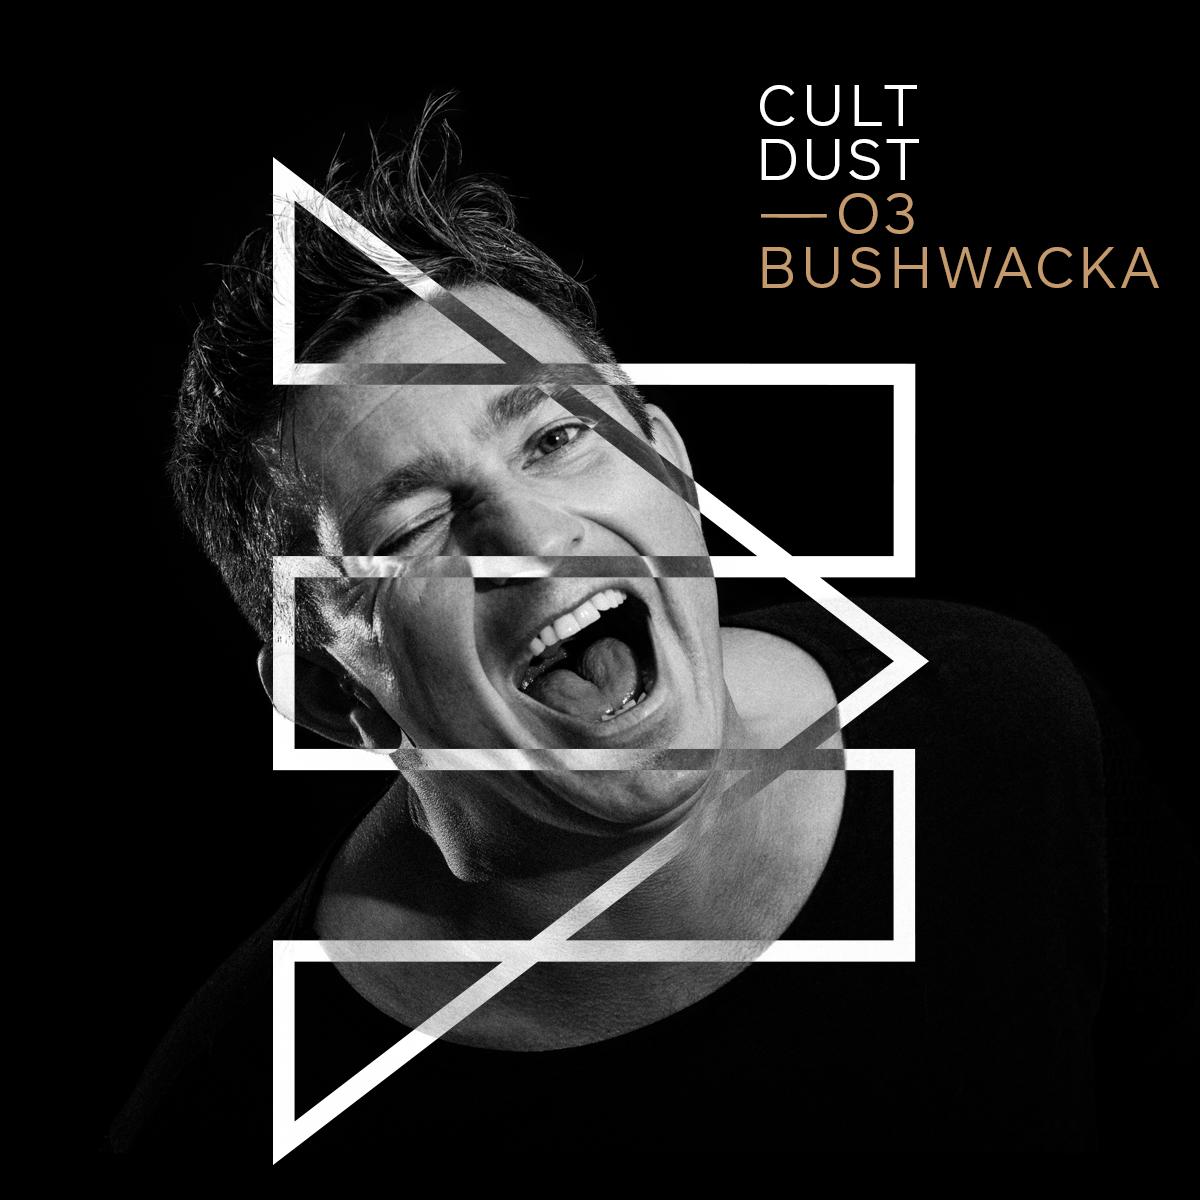 Bushwacka CultDust.jpg